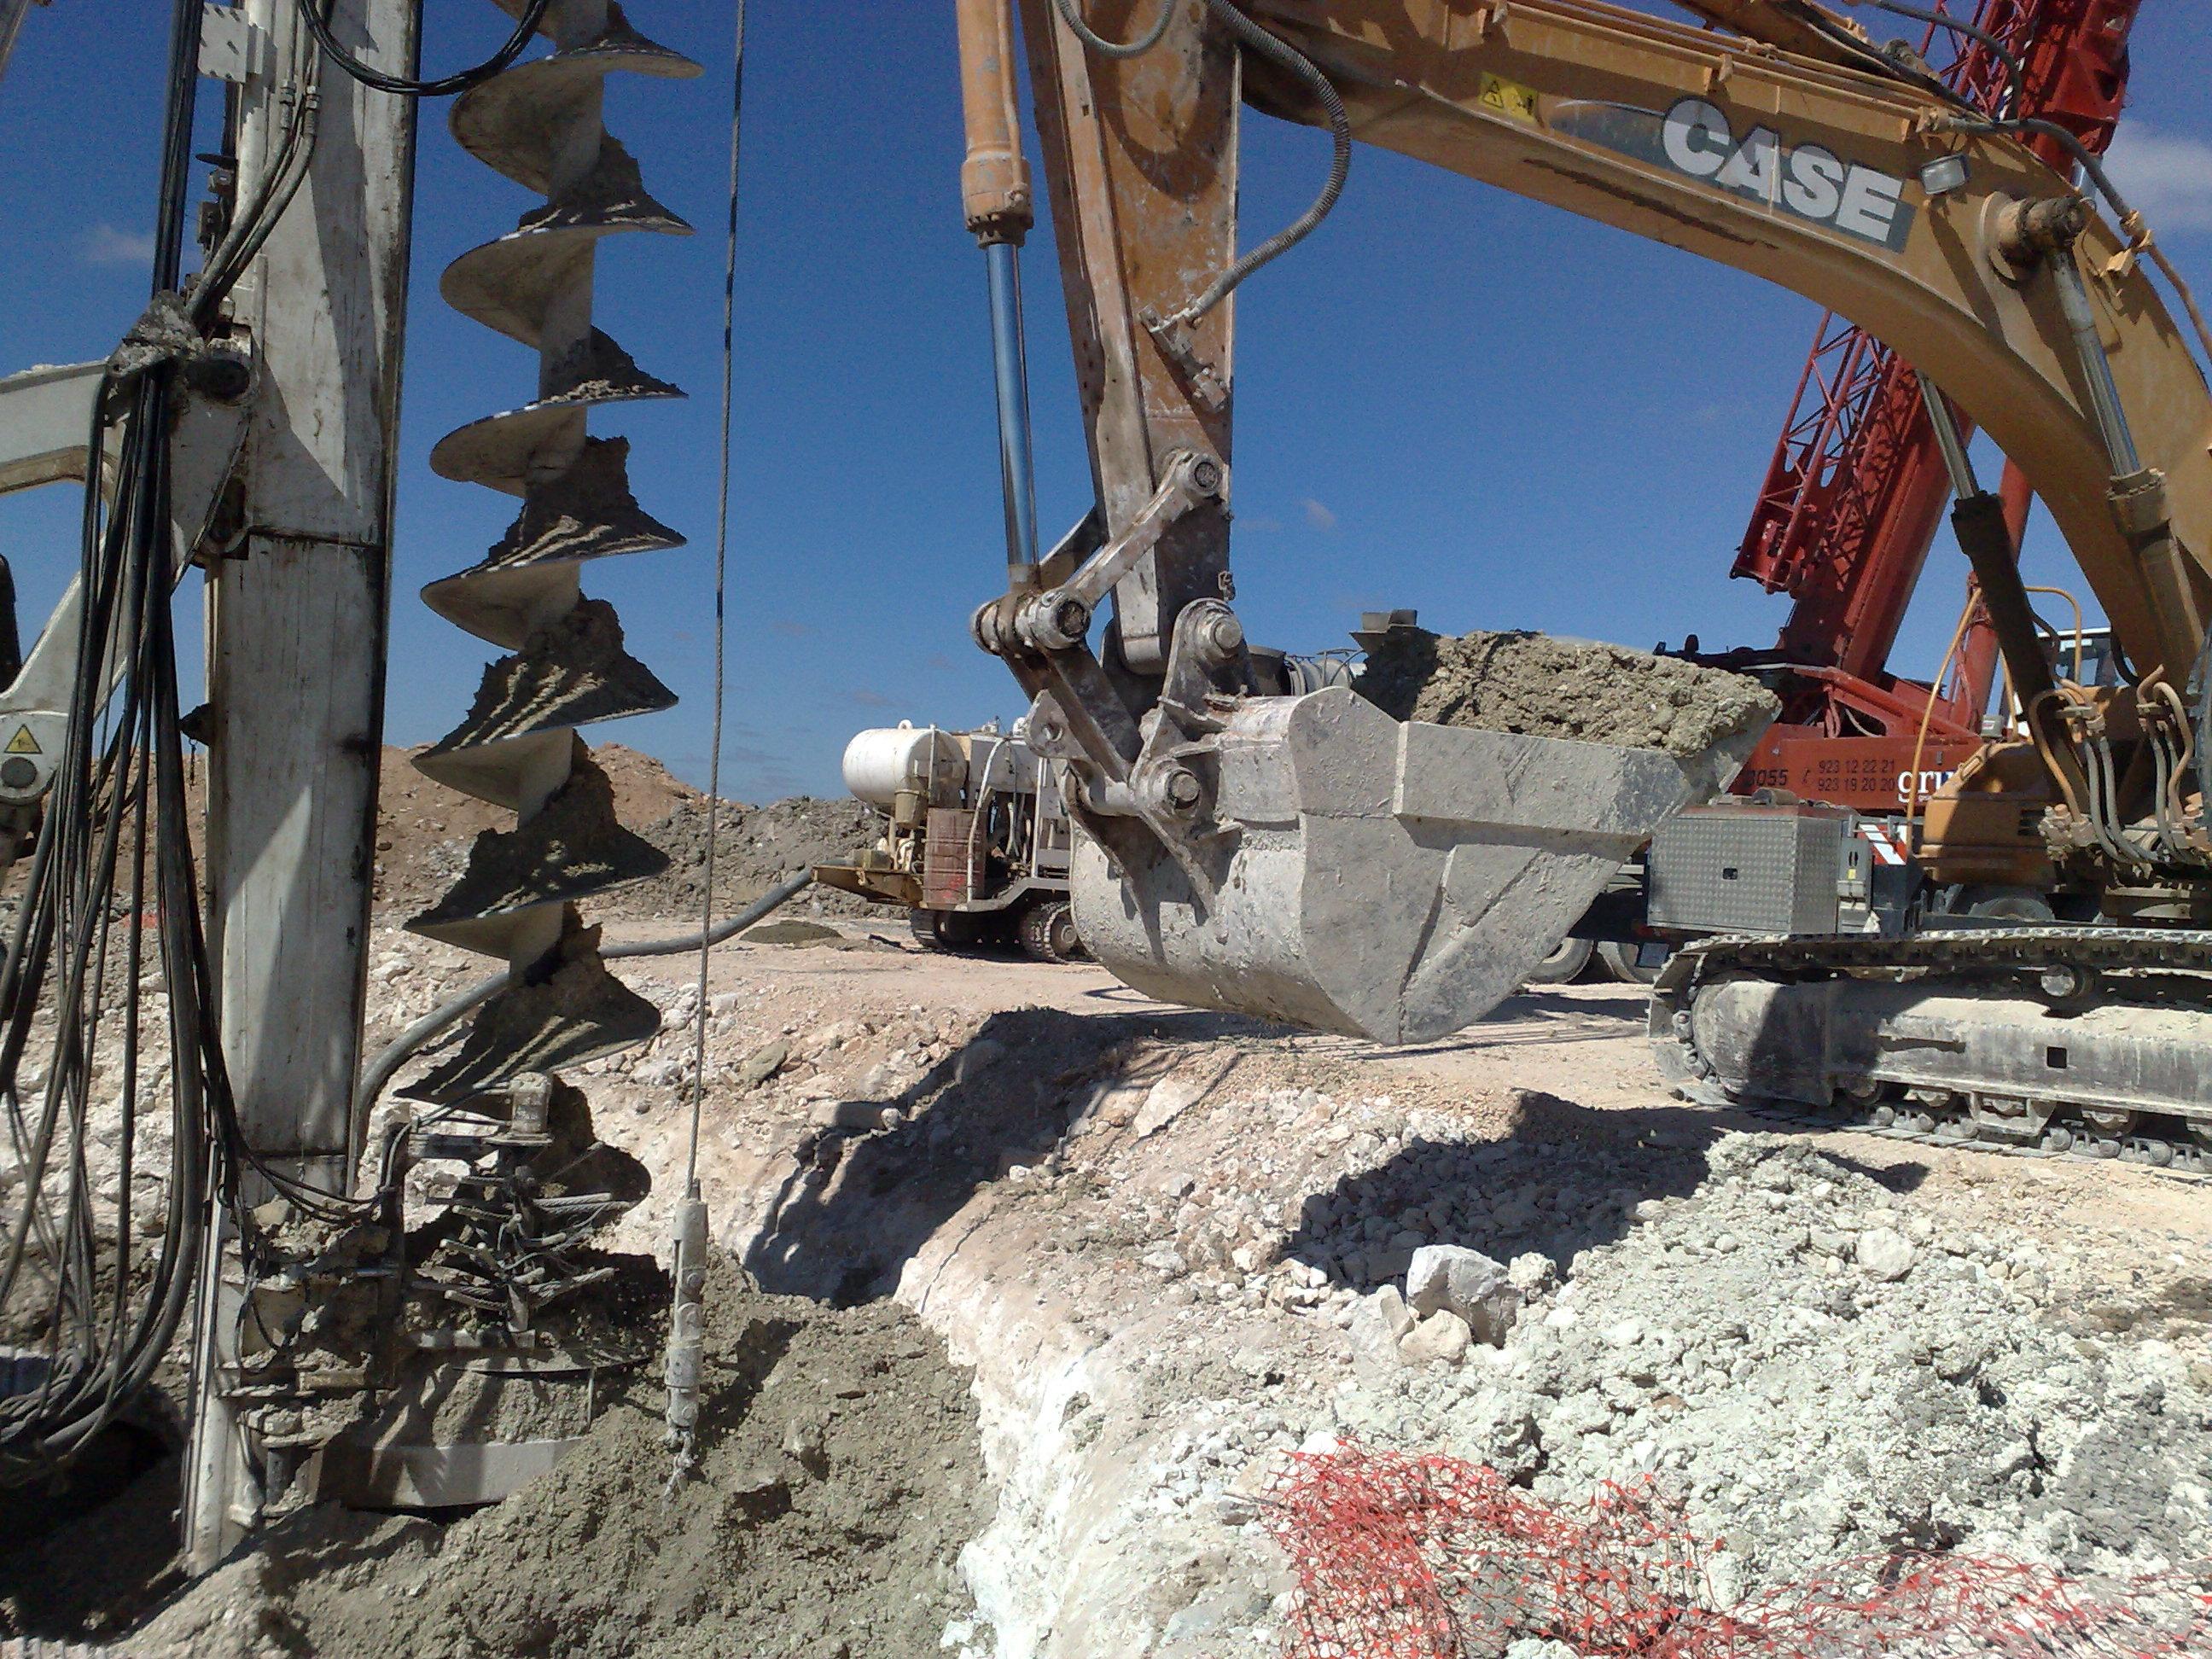 Wind turbine foundation piling machine drilling | Wind farms